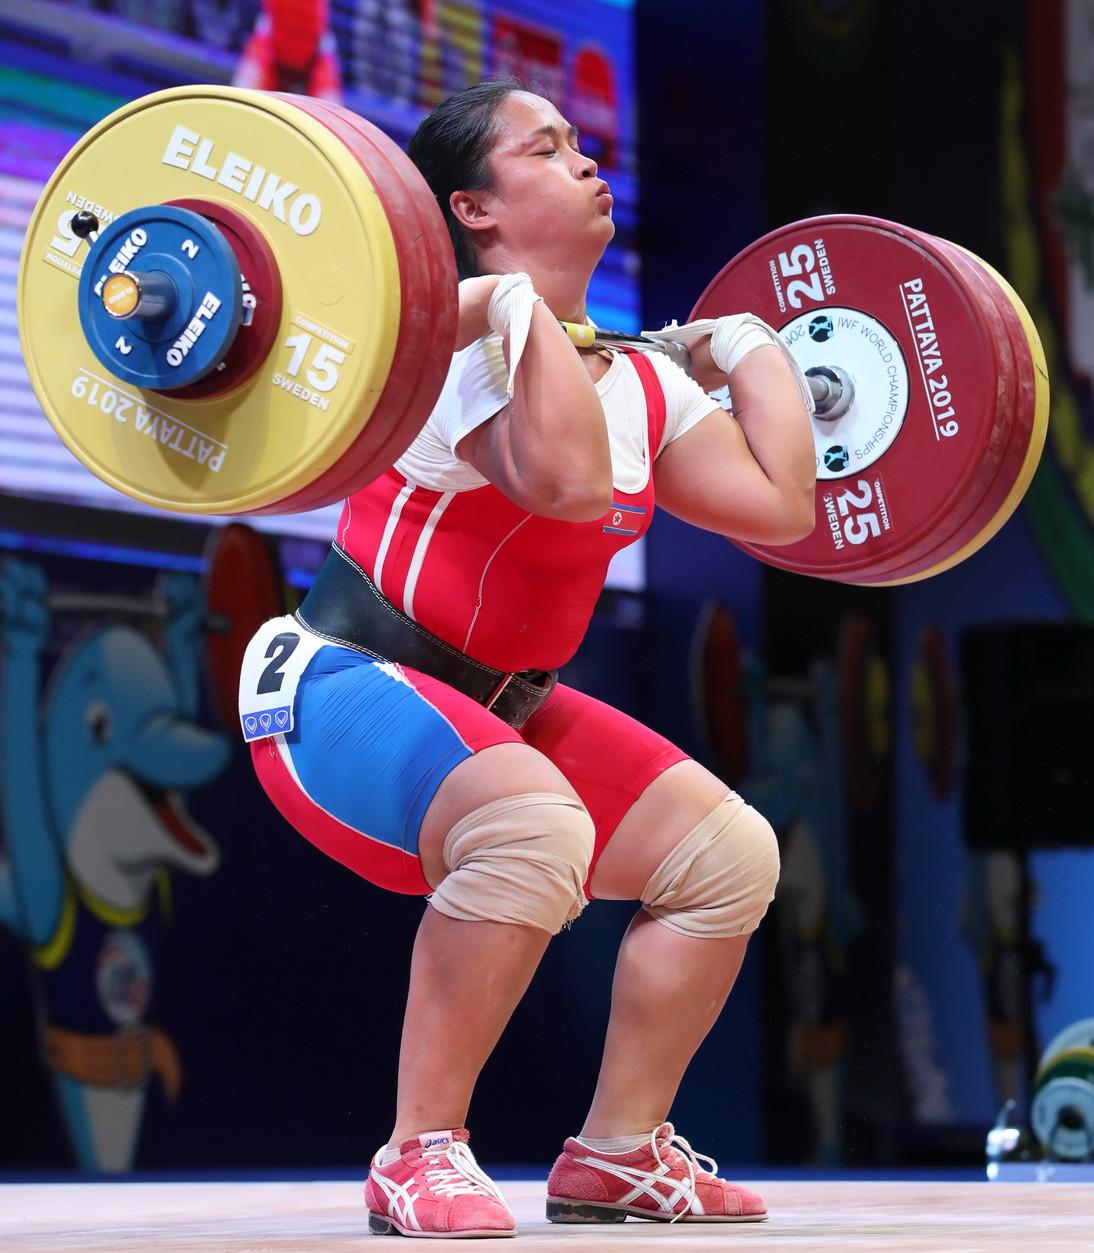 North Korea's Kim Un Ju was the silver medallist in all three events ©IWF